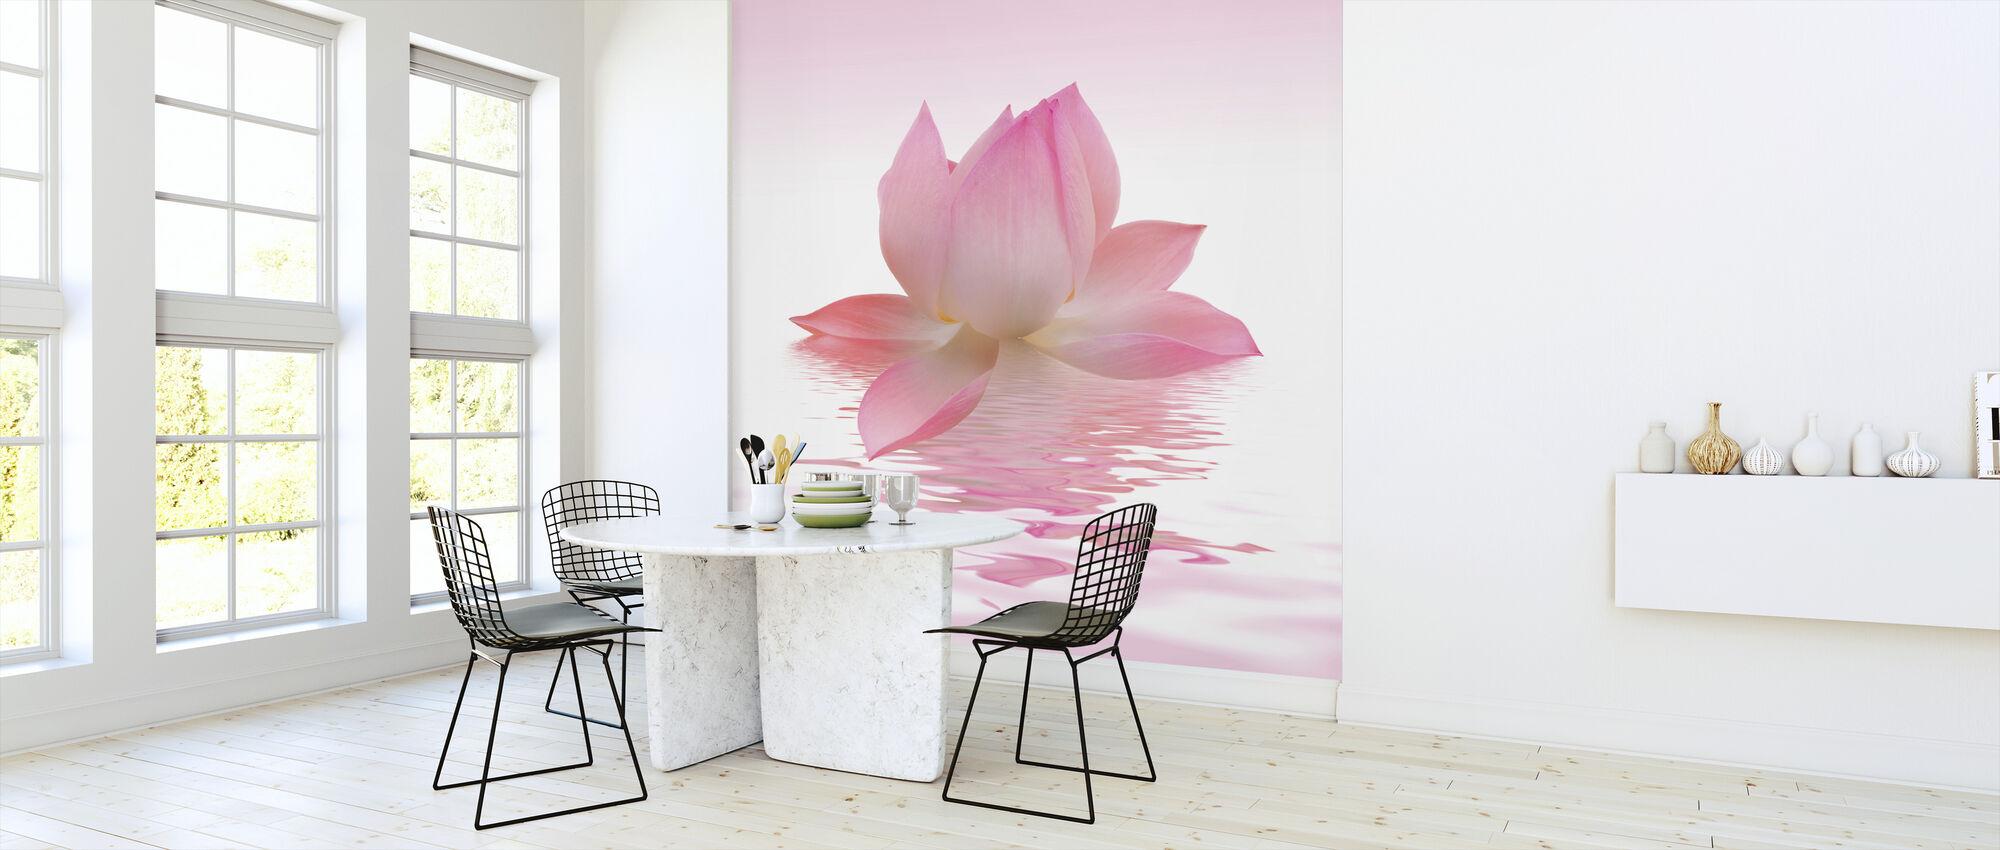 Rosa Lotus - Tapet - Kök